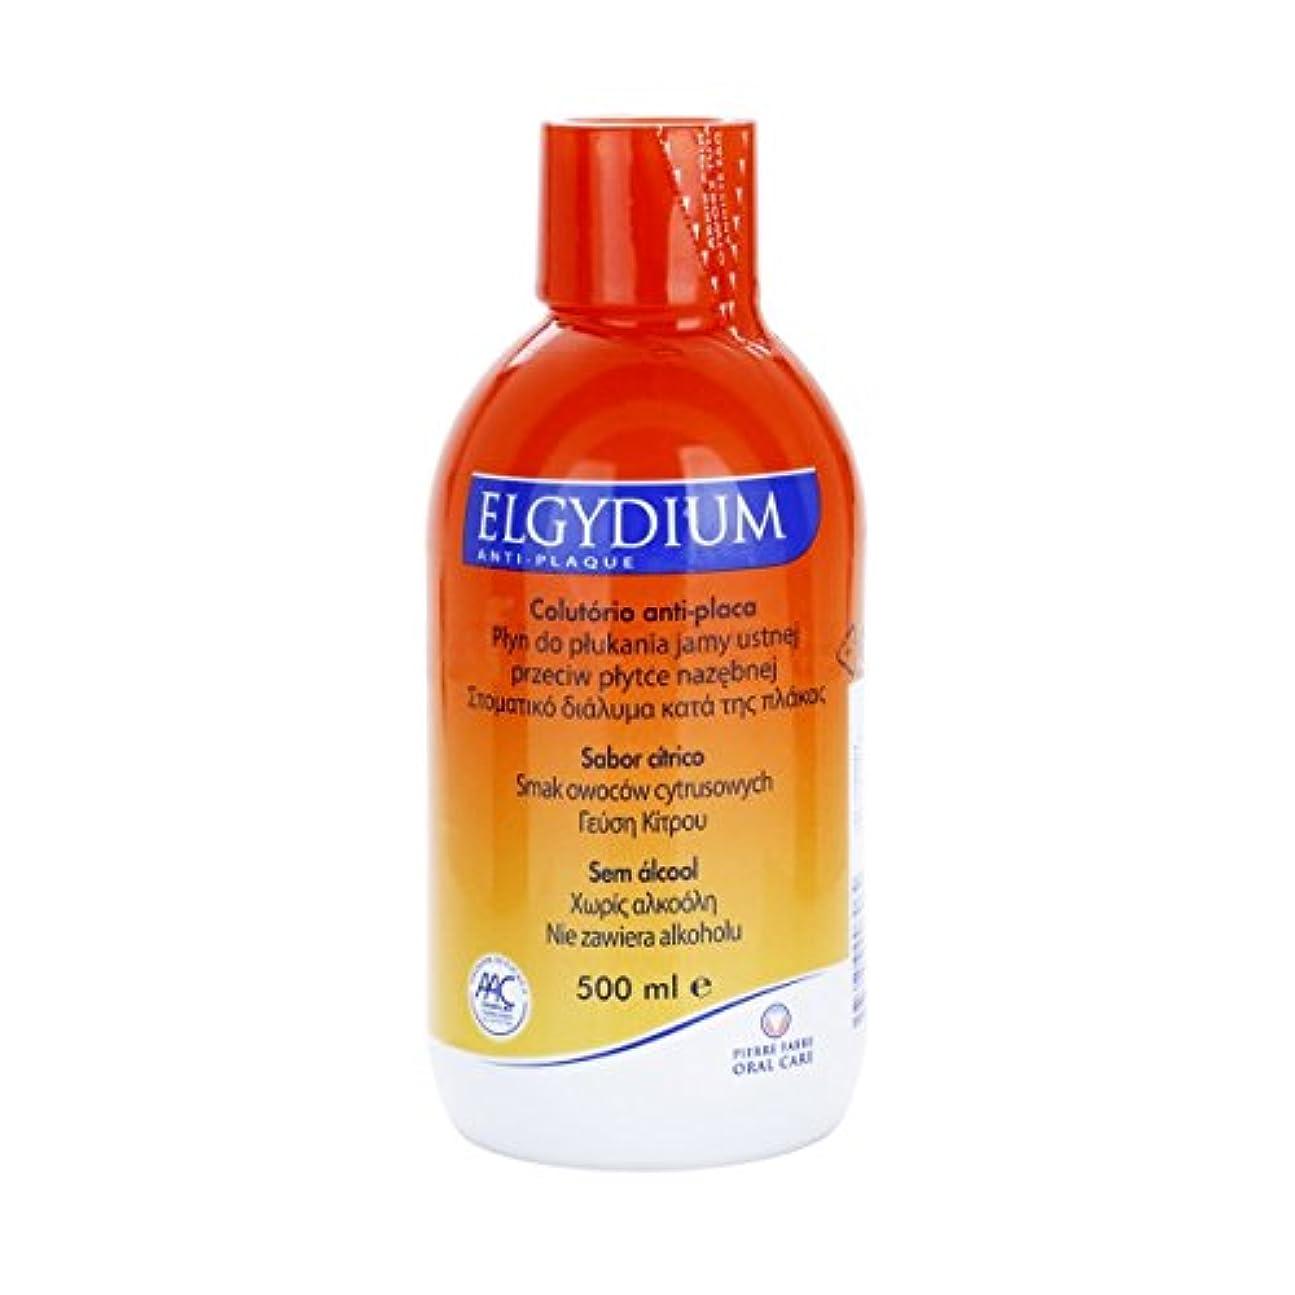 Elgydium Anti-plaque Mouthwash 500ml [並行輸入品]